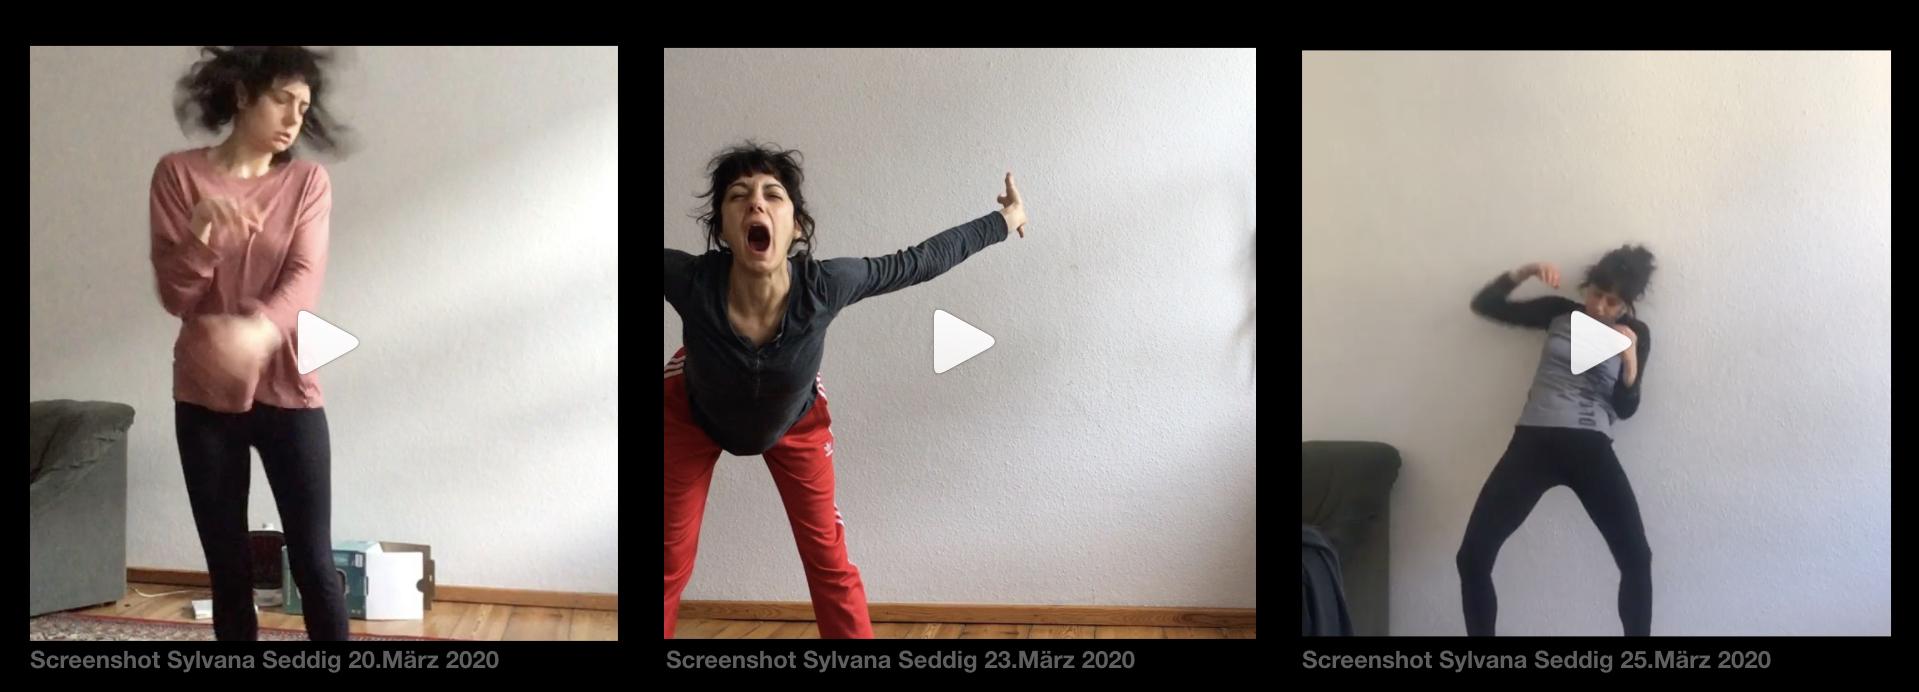 Screenshots Sylvana Seddig im Corona Taumel